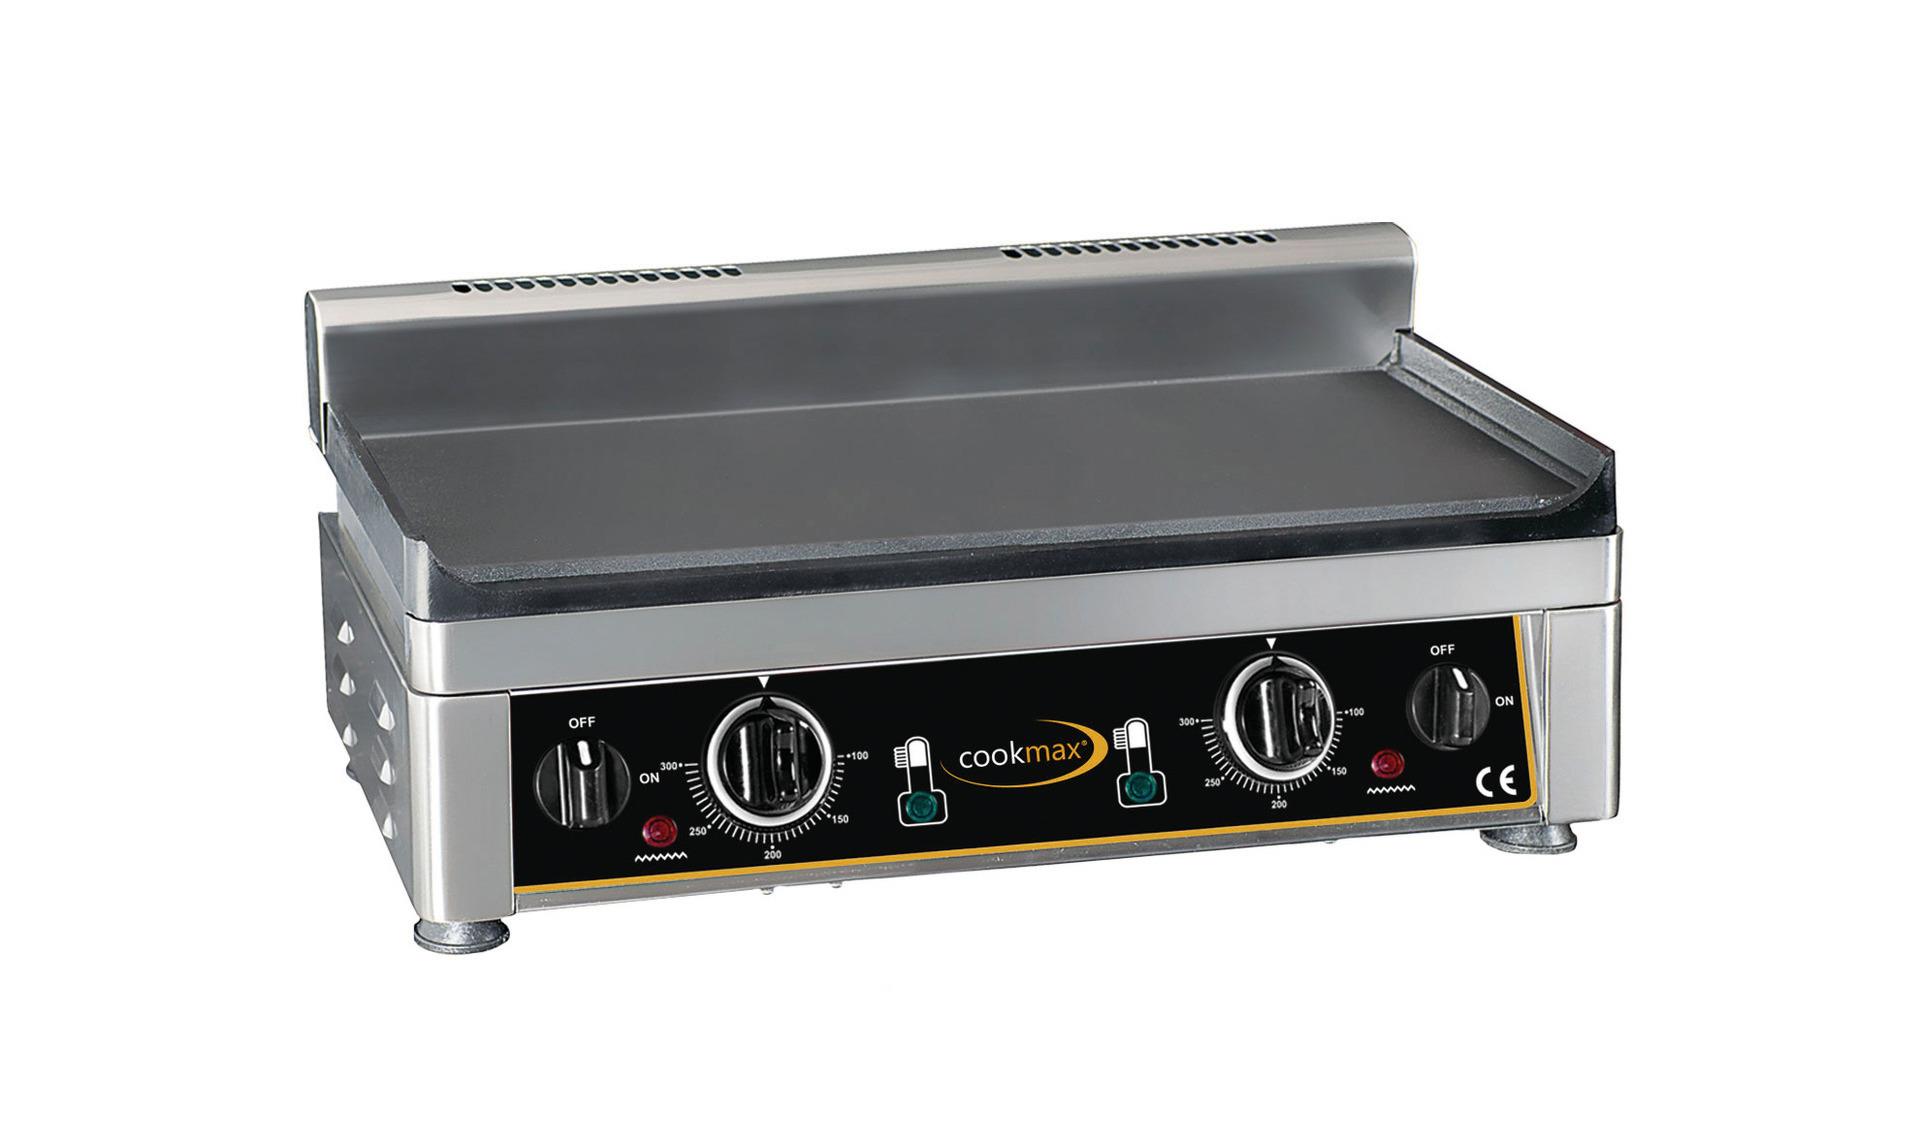 Elektro-Grillplatte glatt 2 Heizzonen 560 x 440 x 300 mm